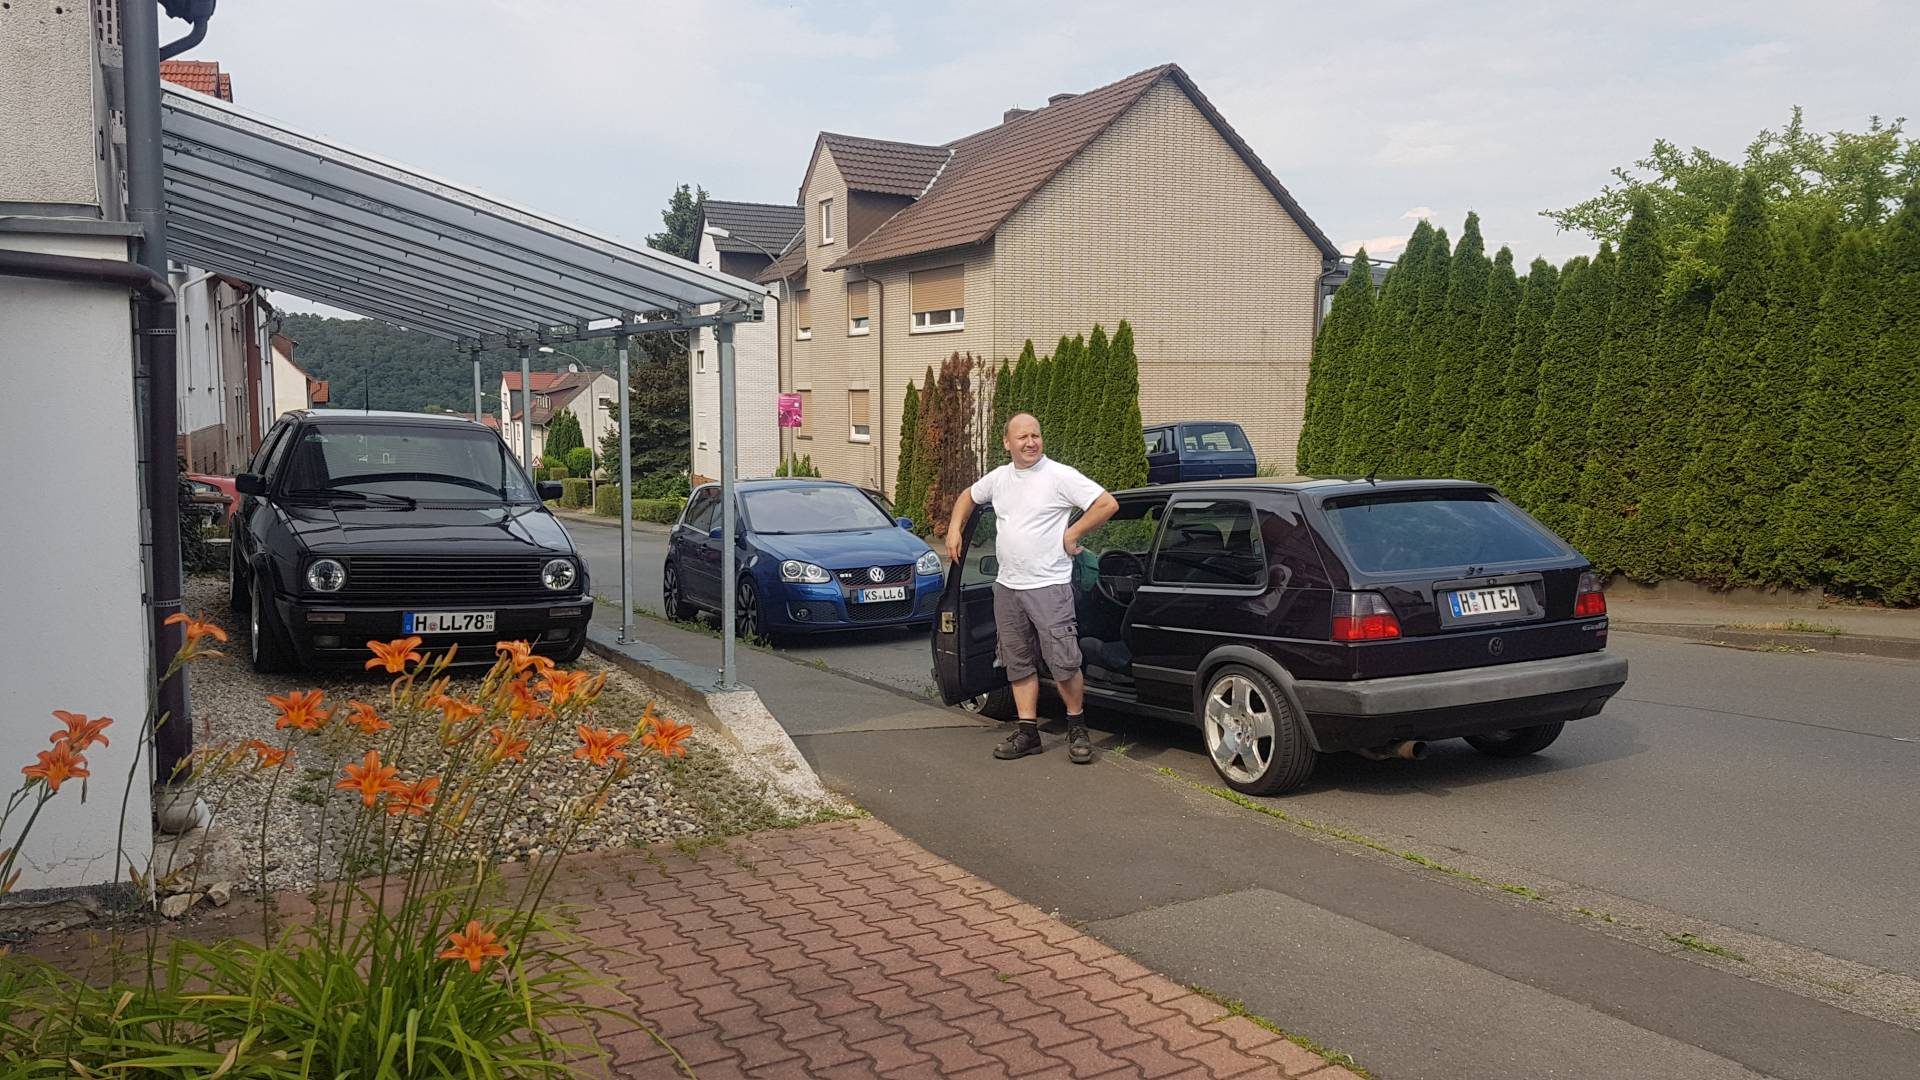 Sommer-Grillen_06_2018_02.jpg